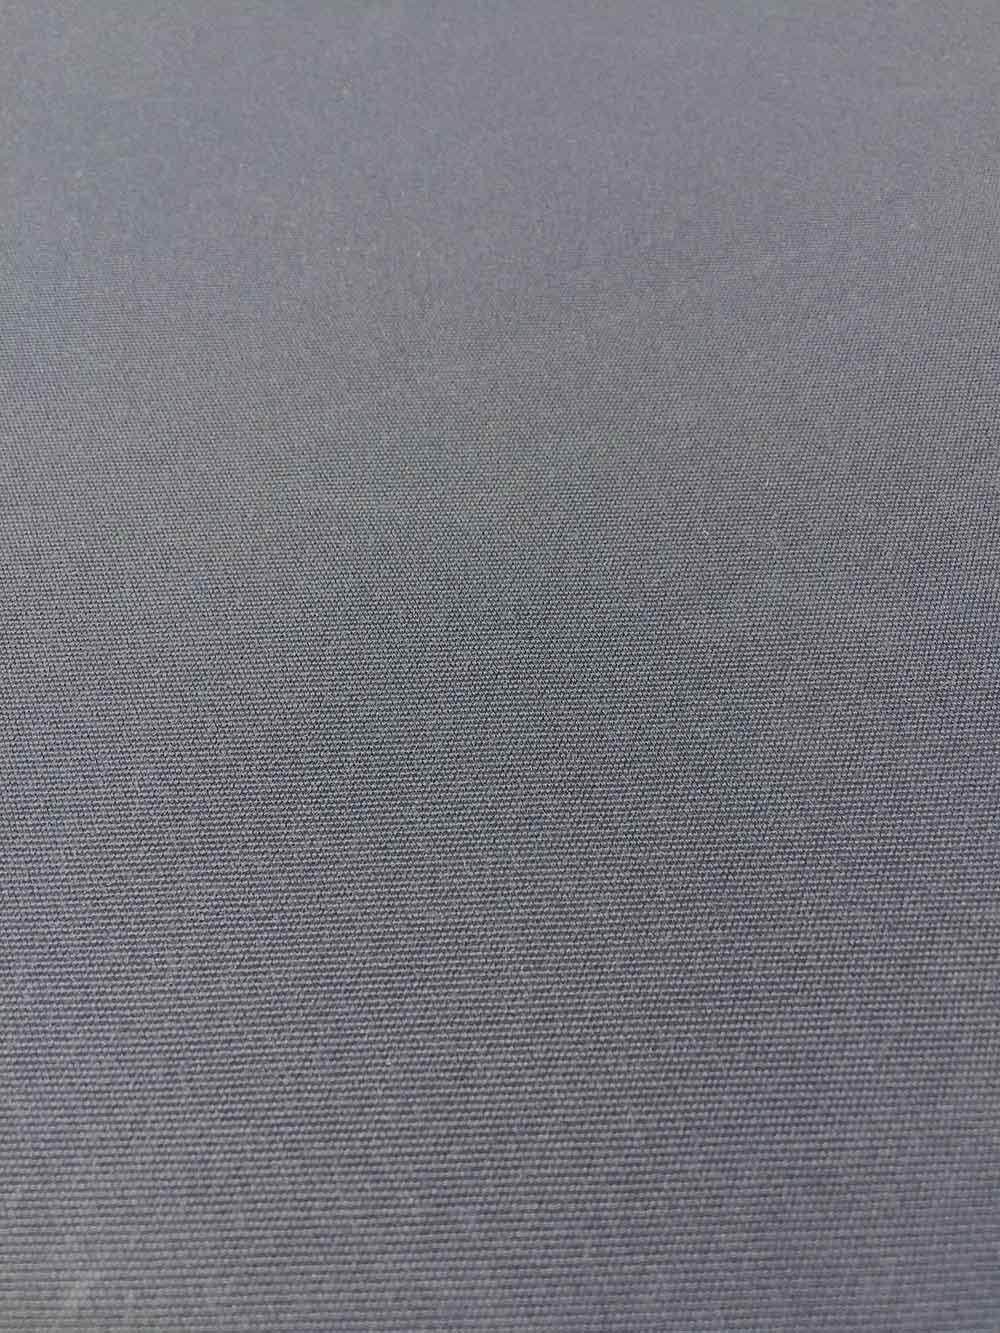 acryl doek grijs